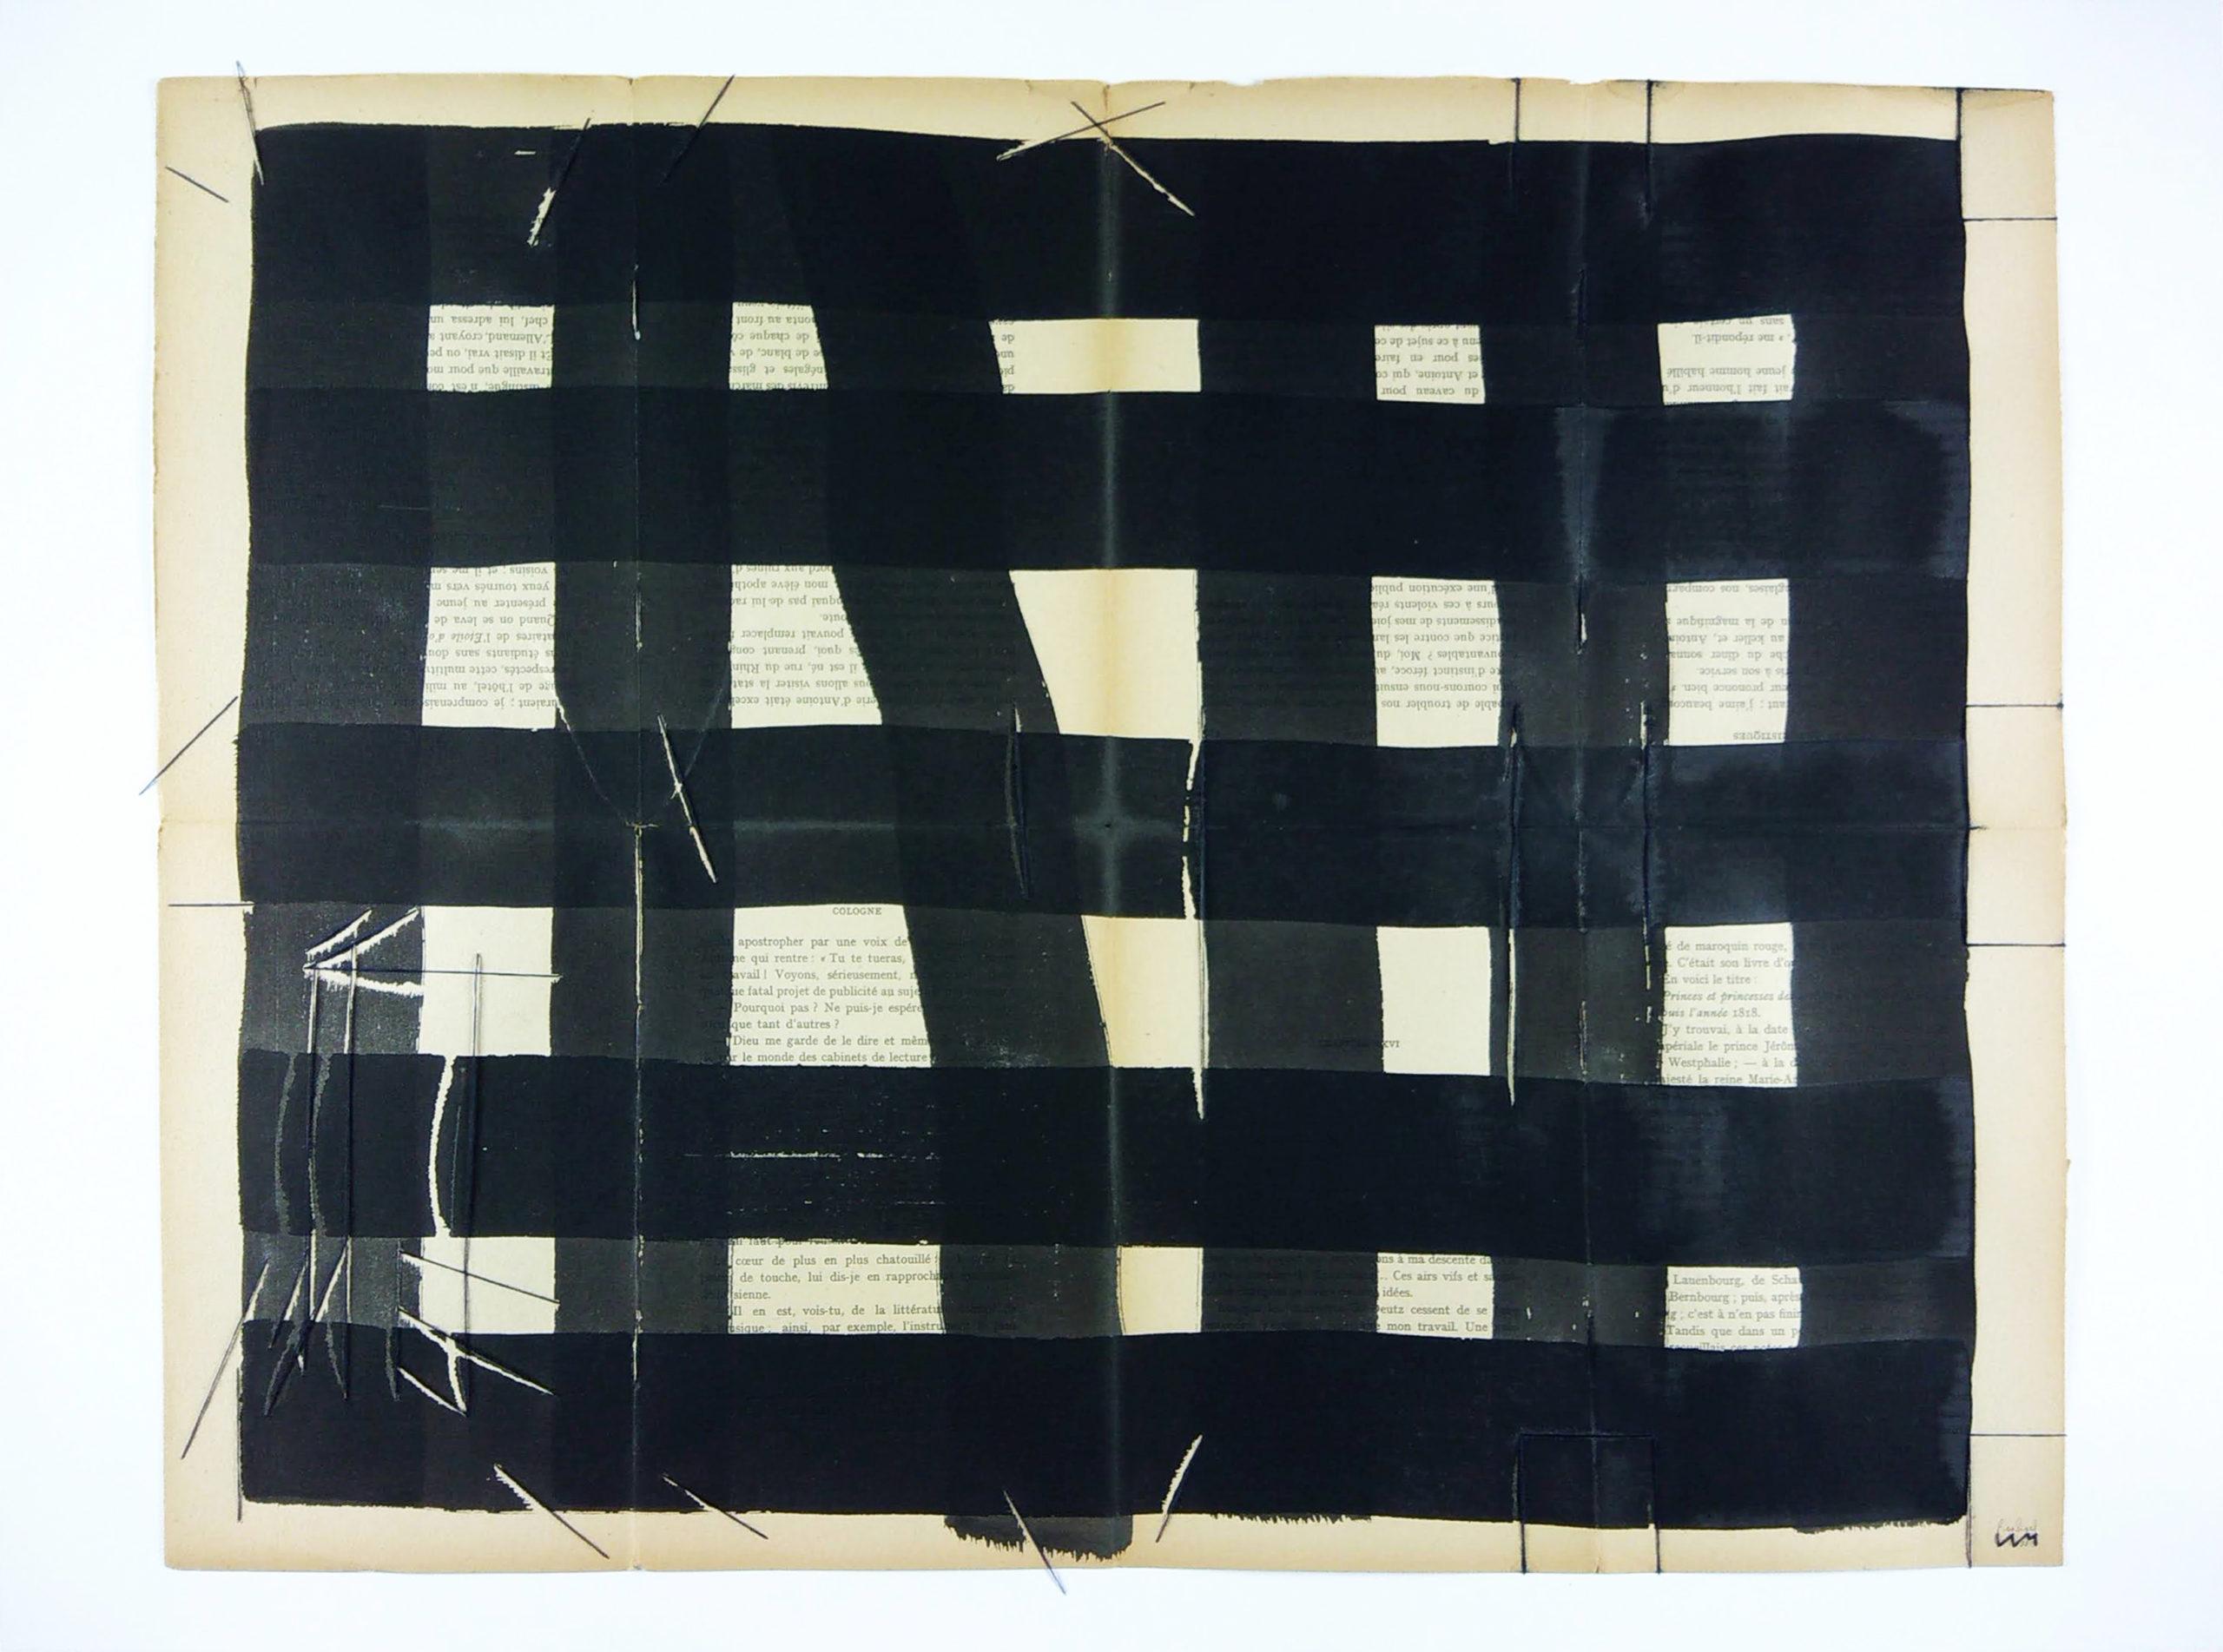 2019-Raphael-Lam-Dessin-Voyages-Humoristiques-F02-57x76-2